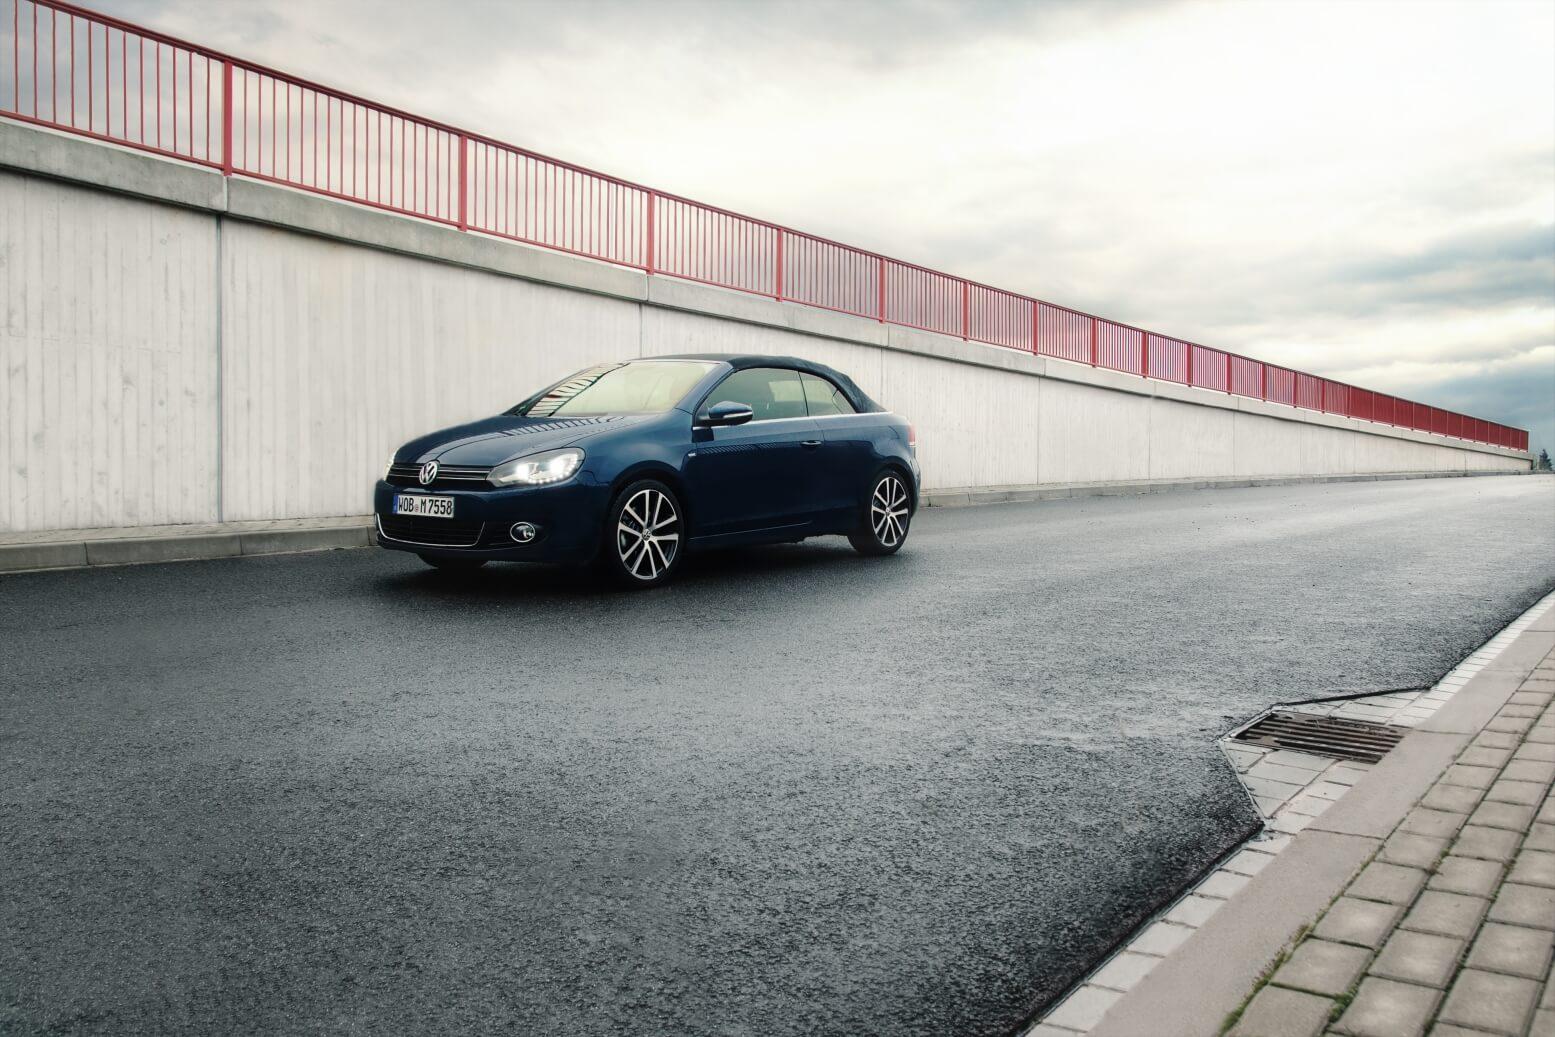 Volkswagen Golf VI Convertible in blau. Erik Draeger Photography